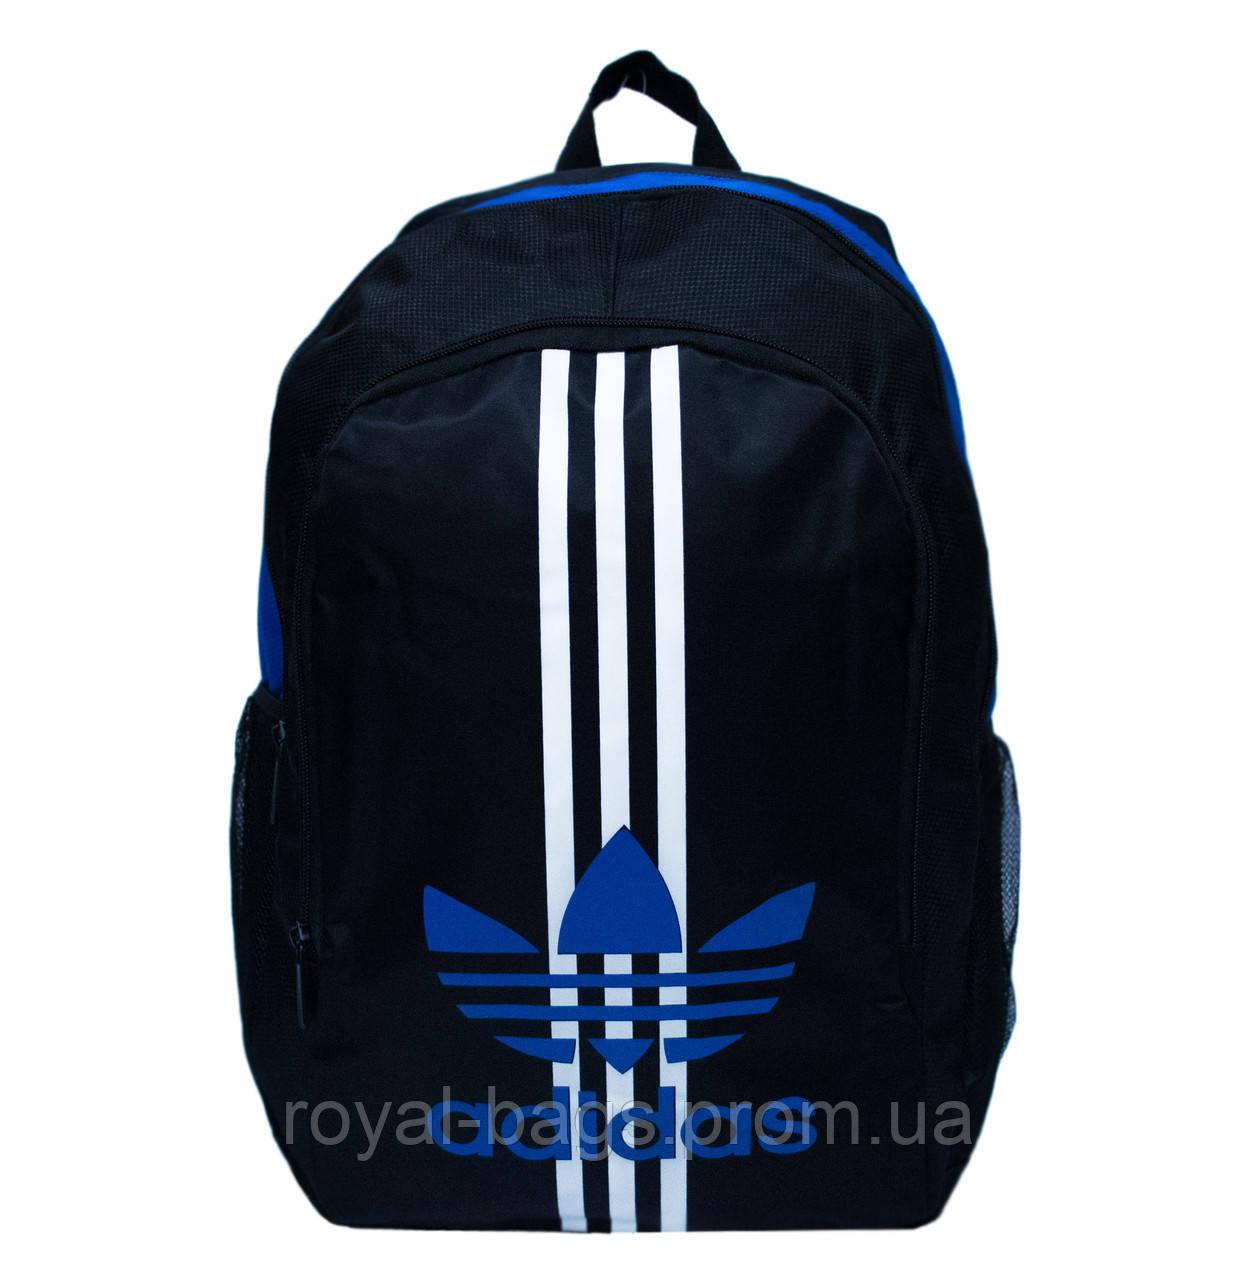 Рюкзак Adidas Sport Life 3 Цвета Синий